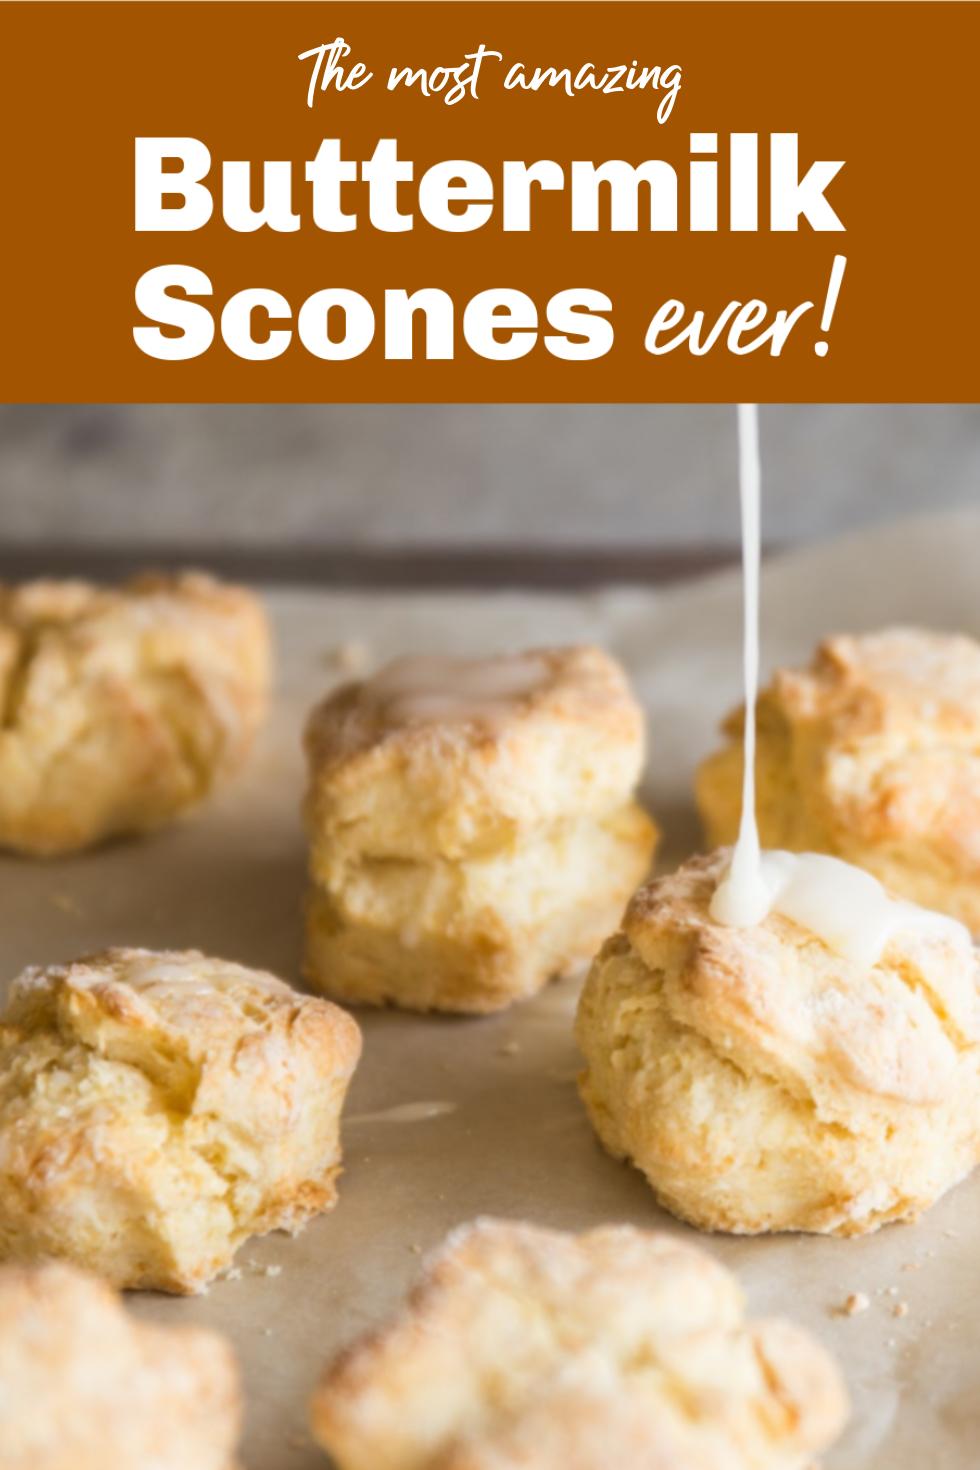 Easy Buttermilk Scones Recipe In 2020 Buttermilk Scone Recipe Buttermilk Recipes Scone Recipe